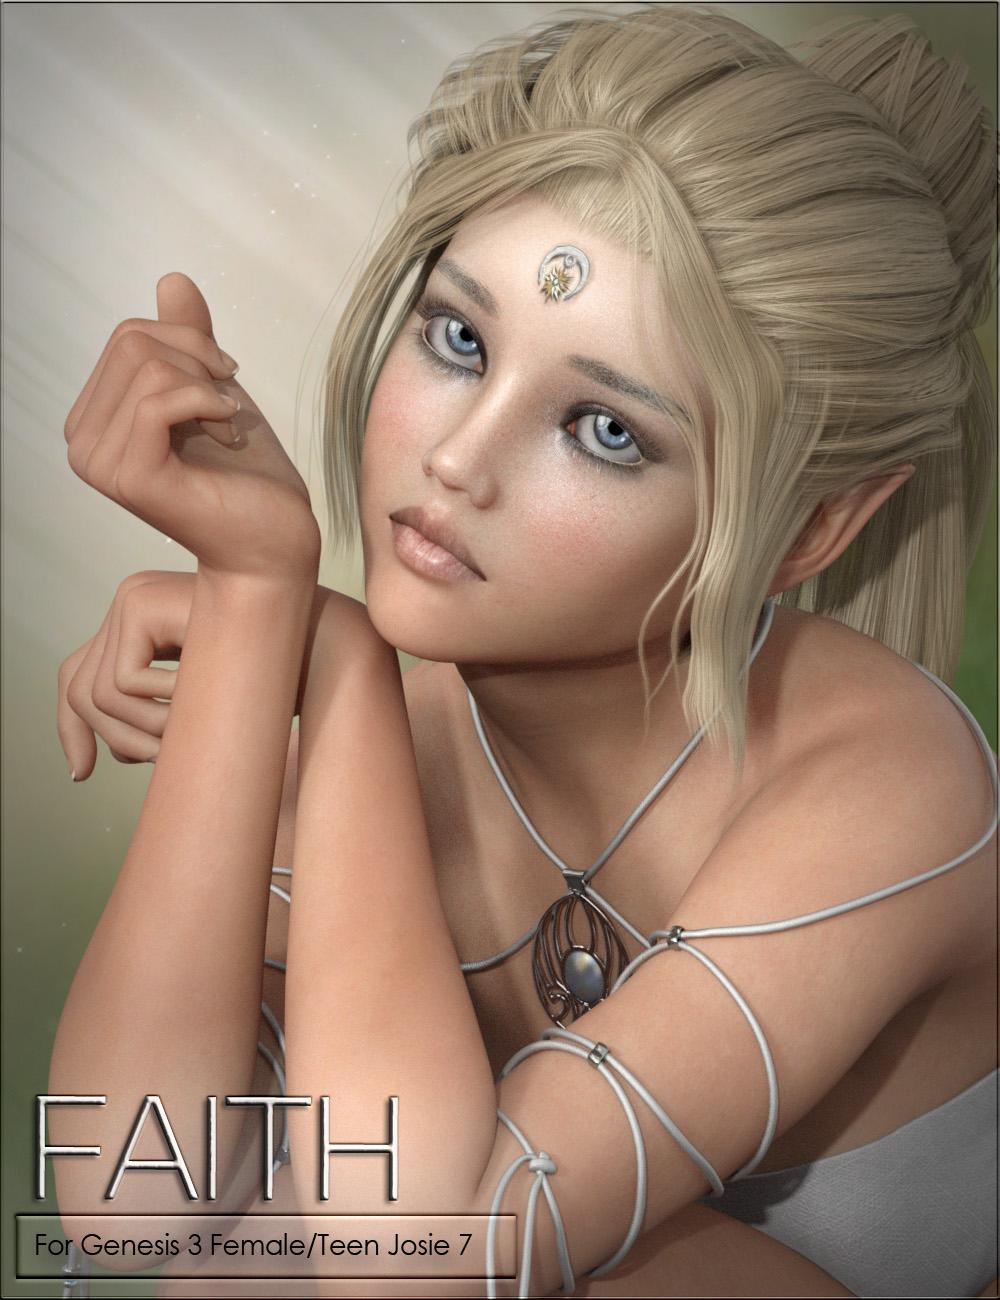 VYK Faith for Genesis 3 Female and Teen Josie 7 by: vyktohria, 3D Models by Daz 3D